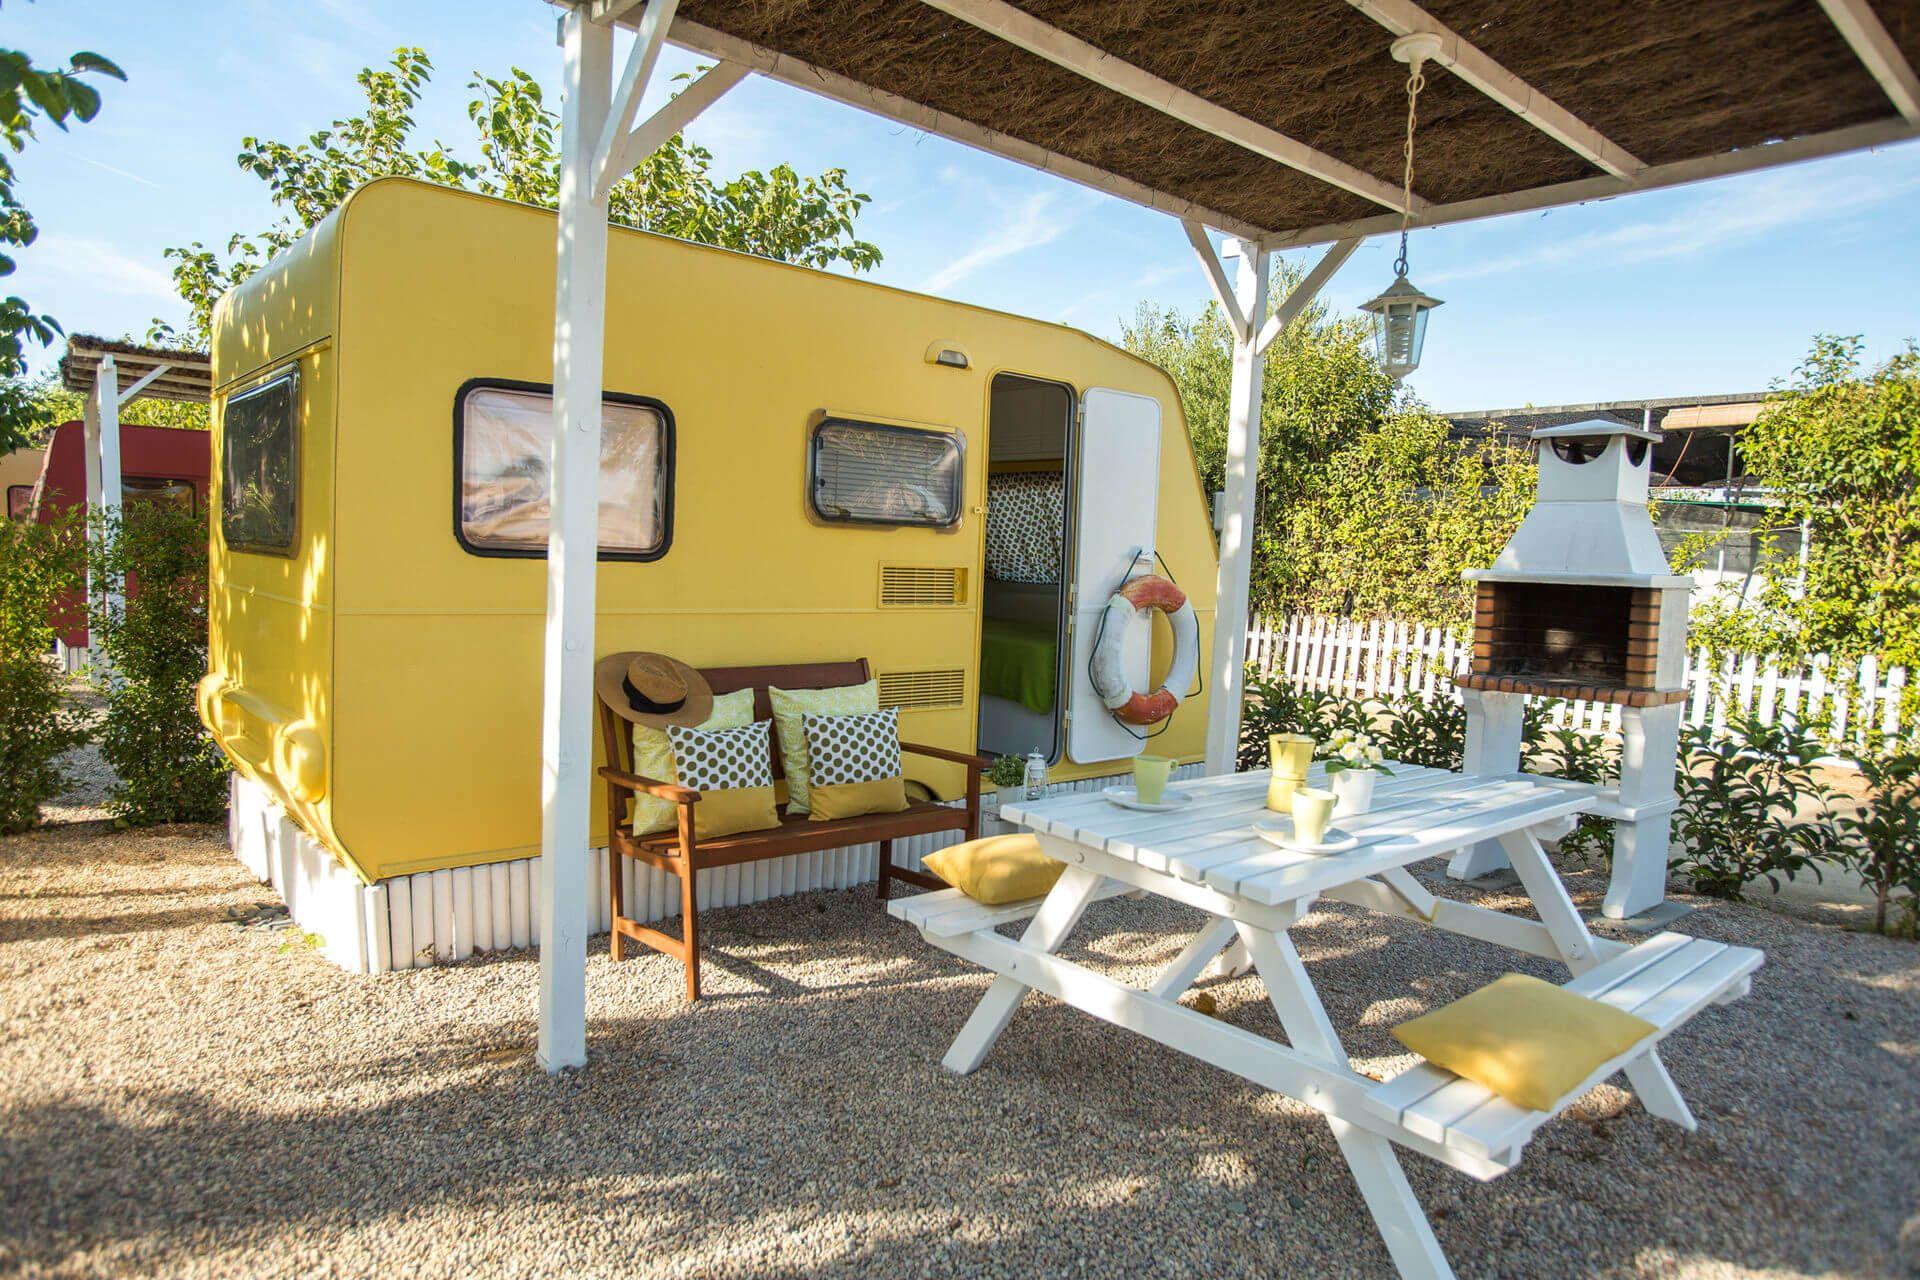 Caravana Amarillo Vainilla | Camping Miramar